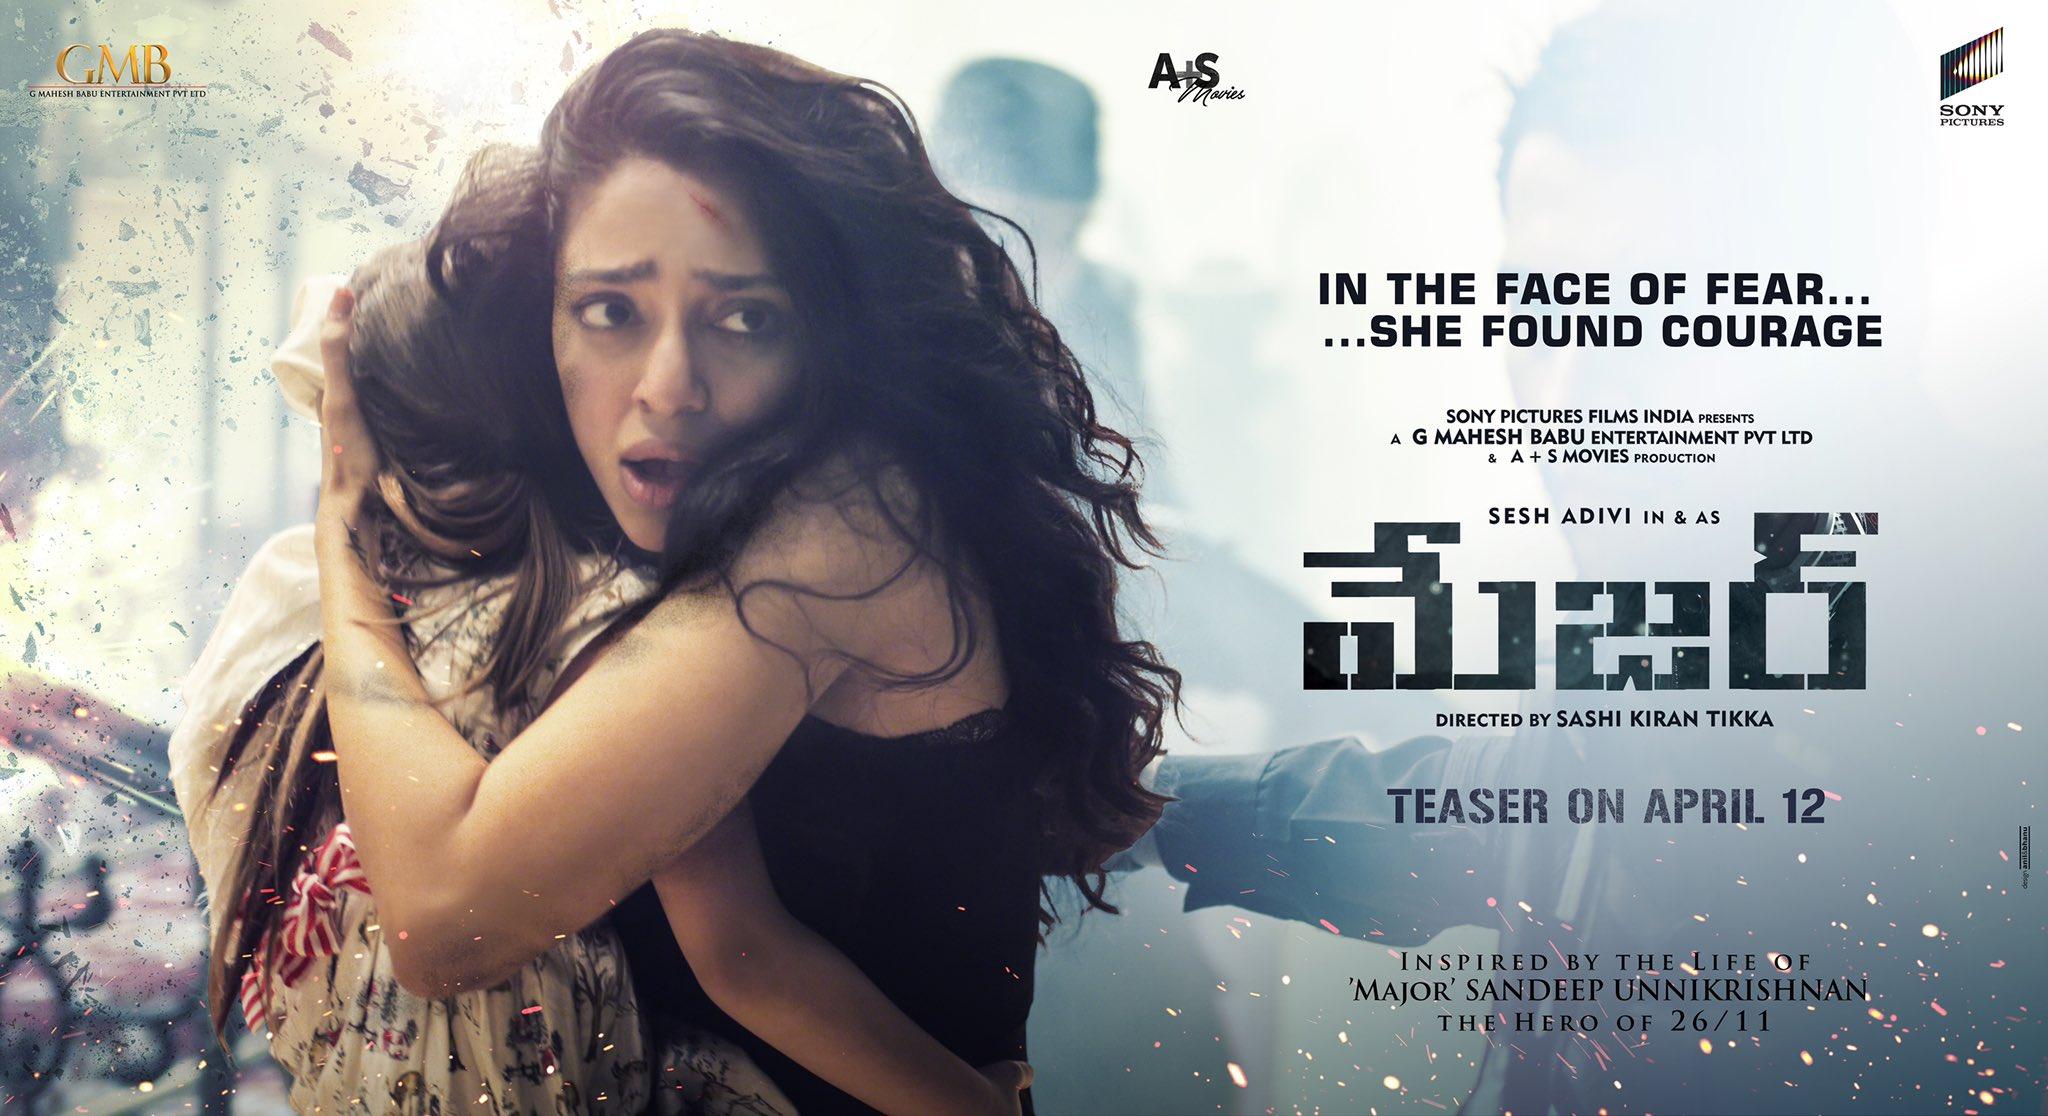 Actress Sobhita Dhulipala Major Telugu Movie HD Posters